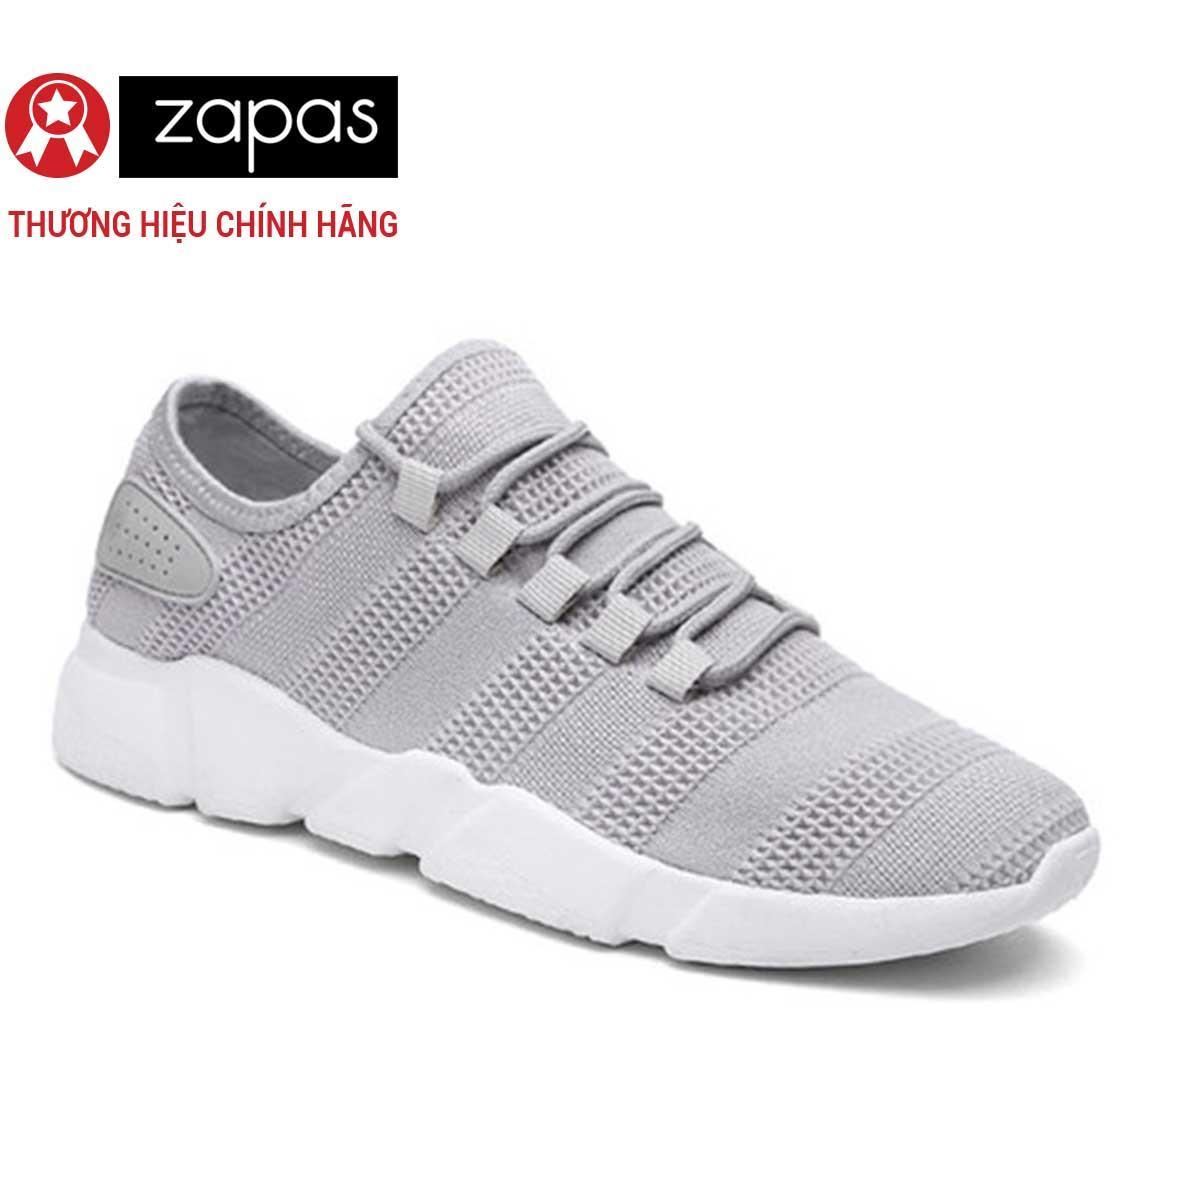 Giày Sneaker Nữ Thời Trang Zapas - GN081 (Xám)